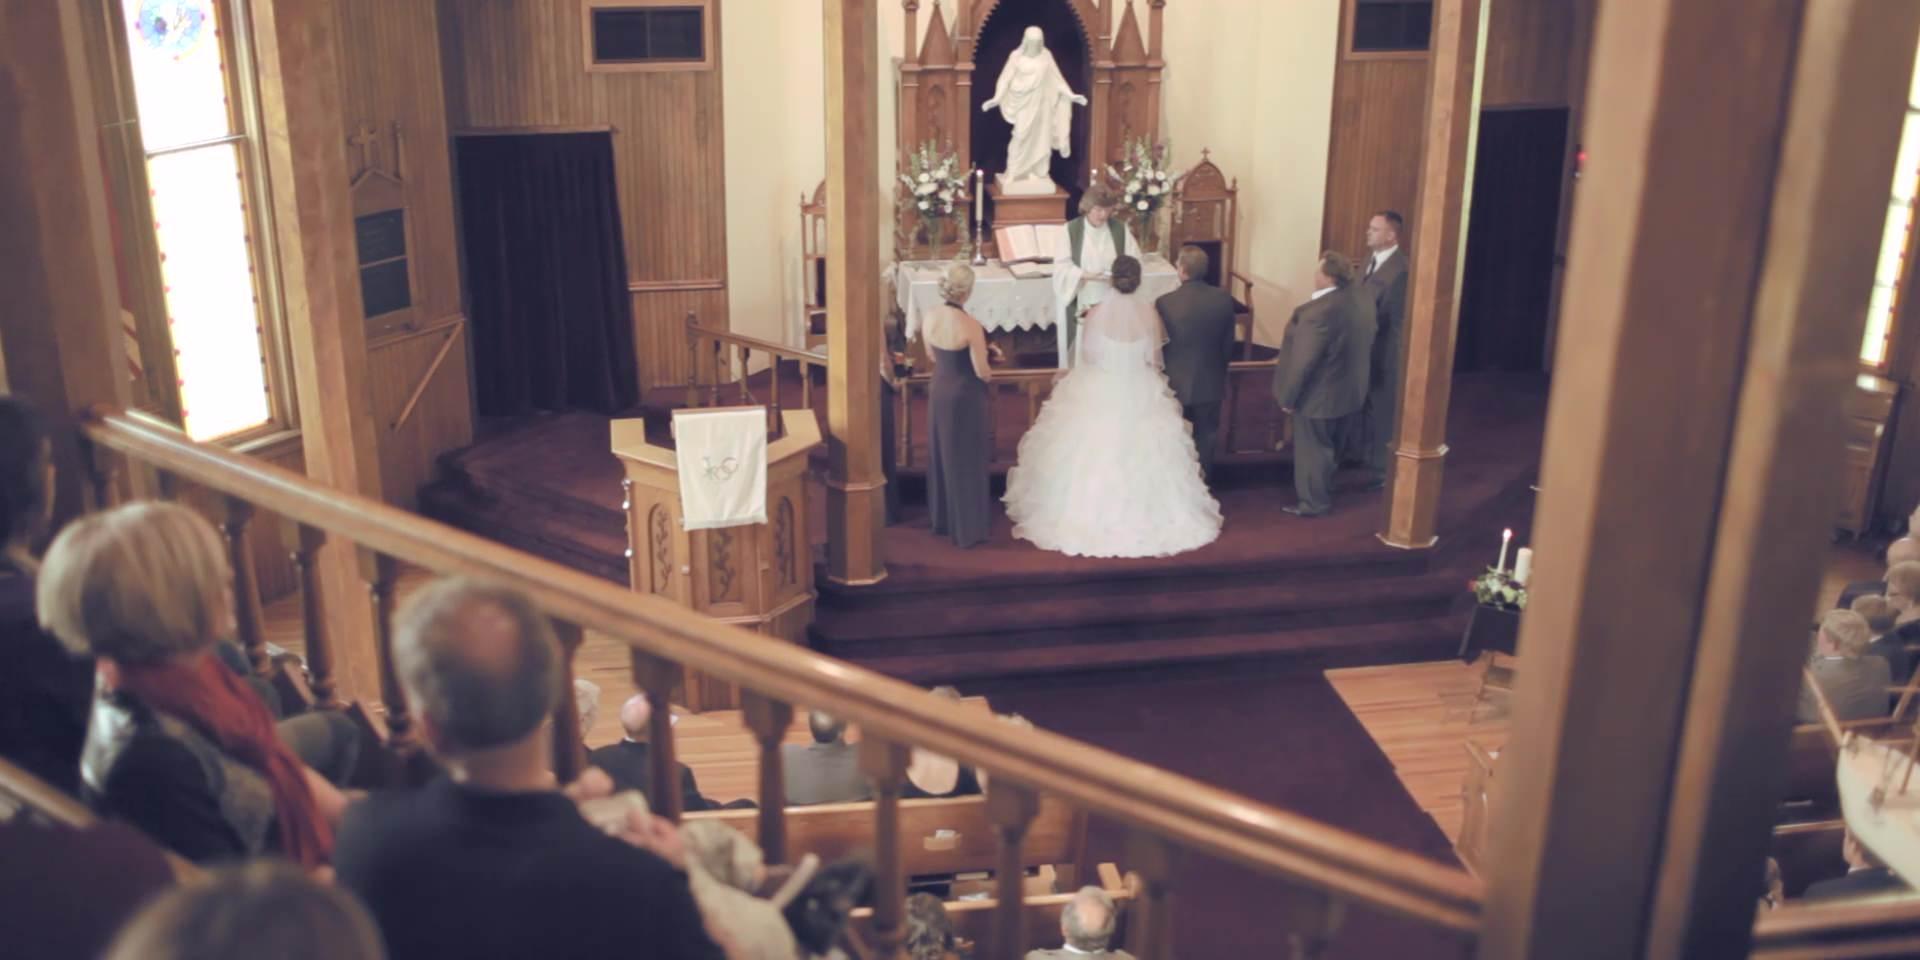 eric&lindsey wedding story.mp4-still00006.jpg